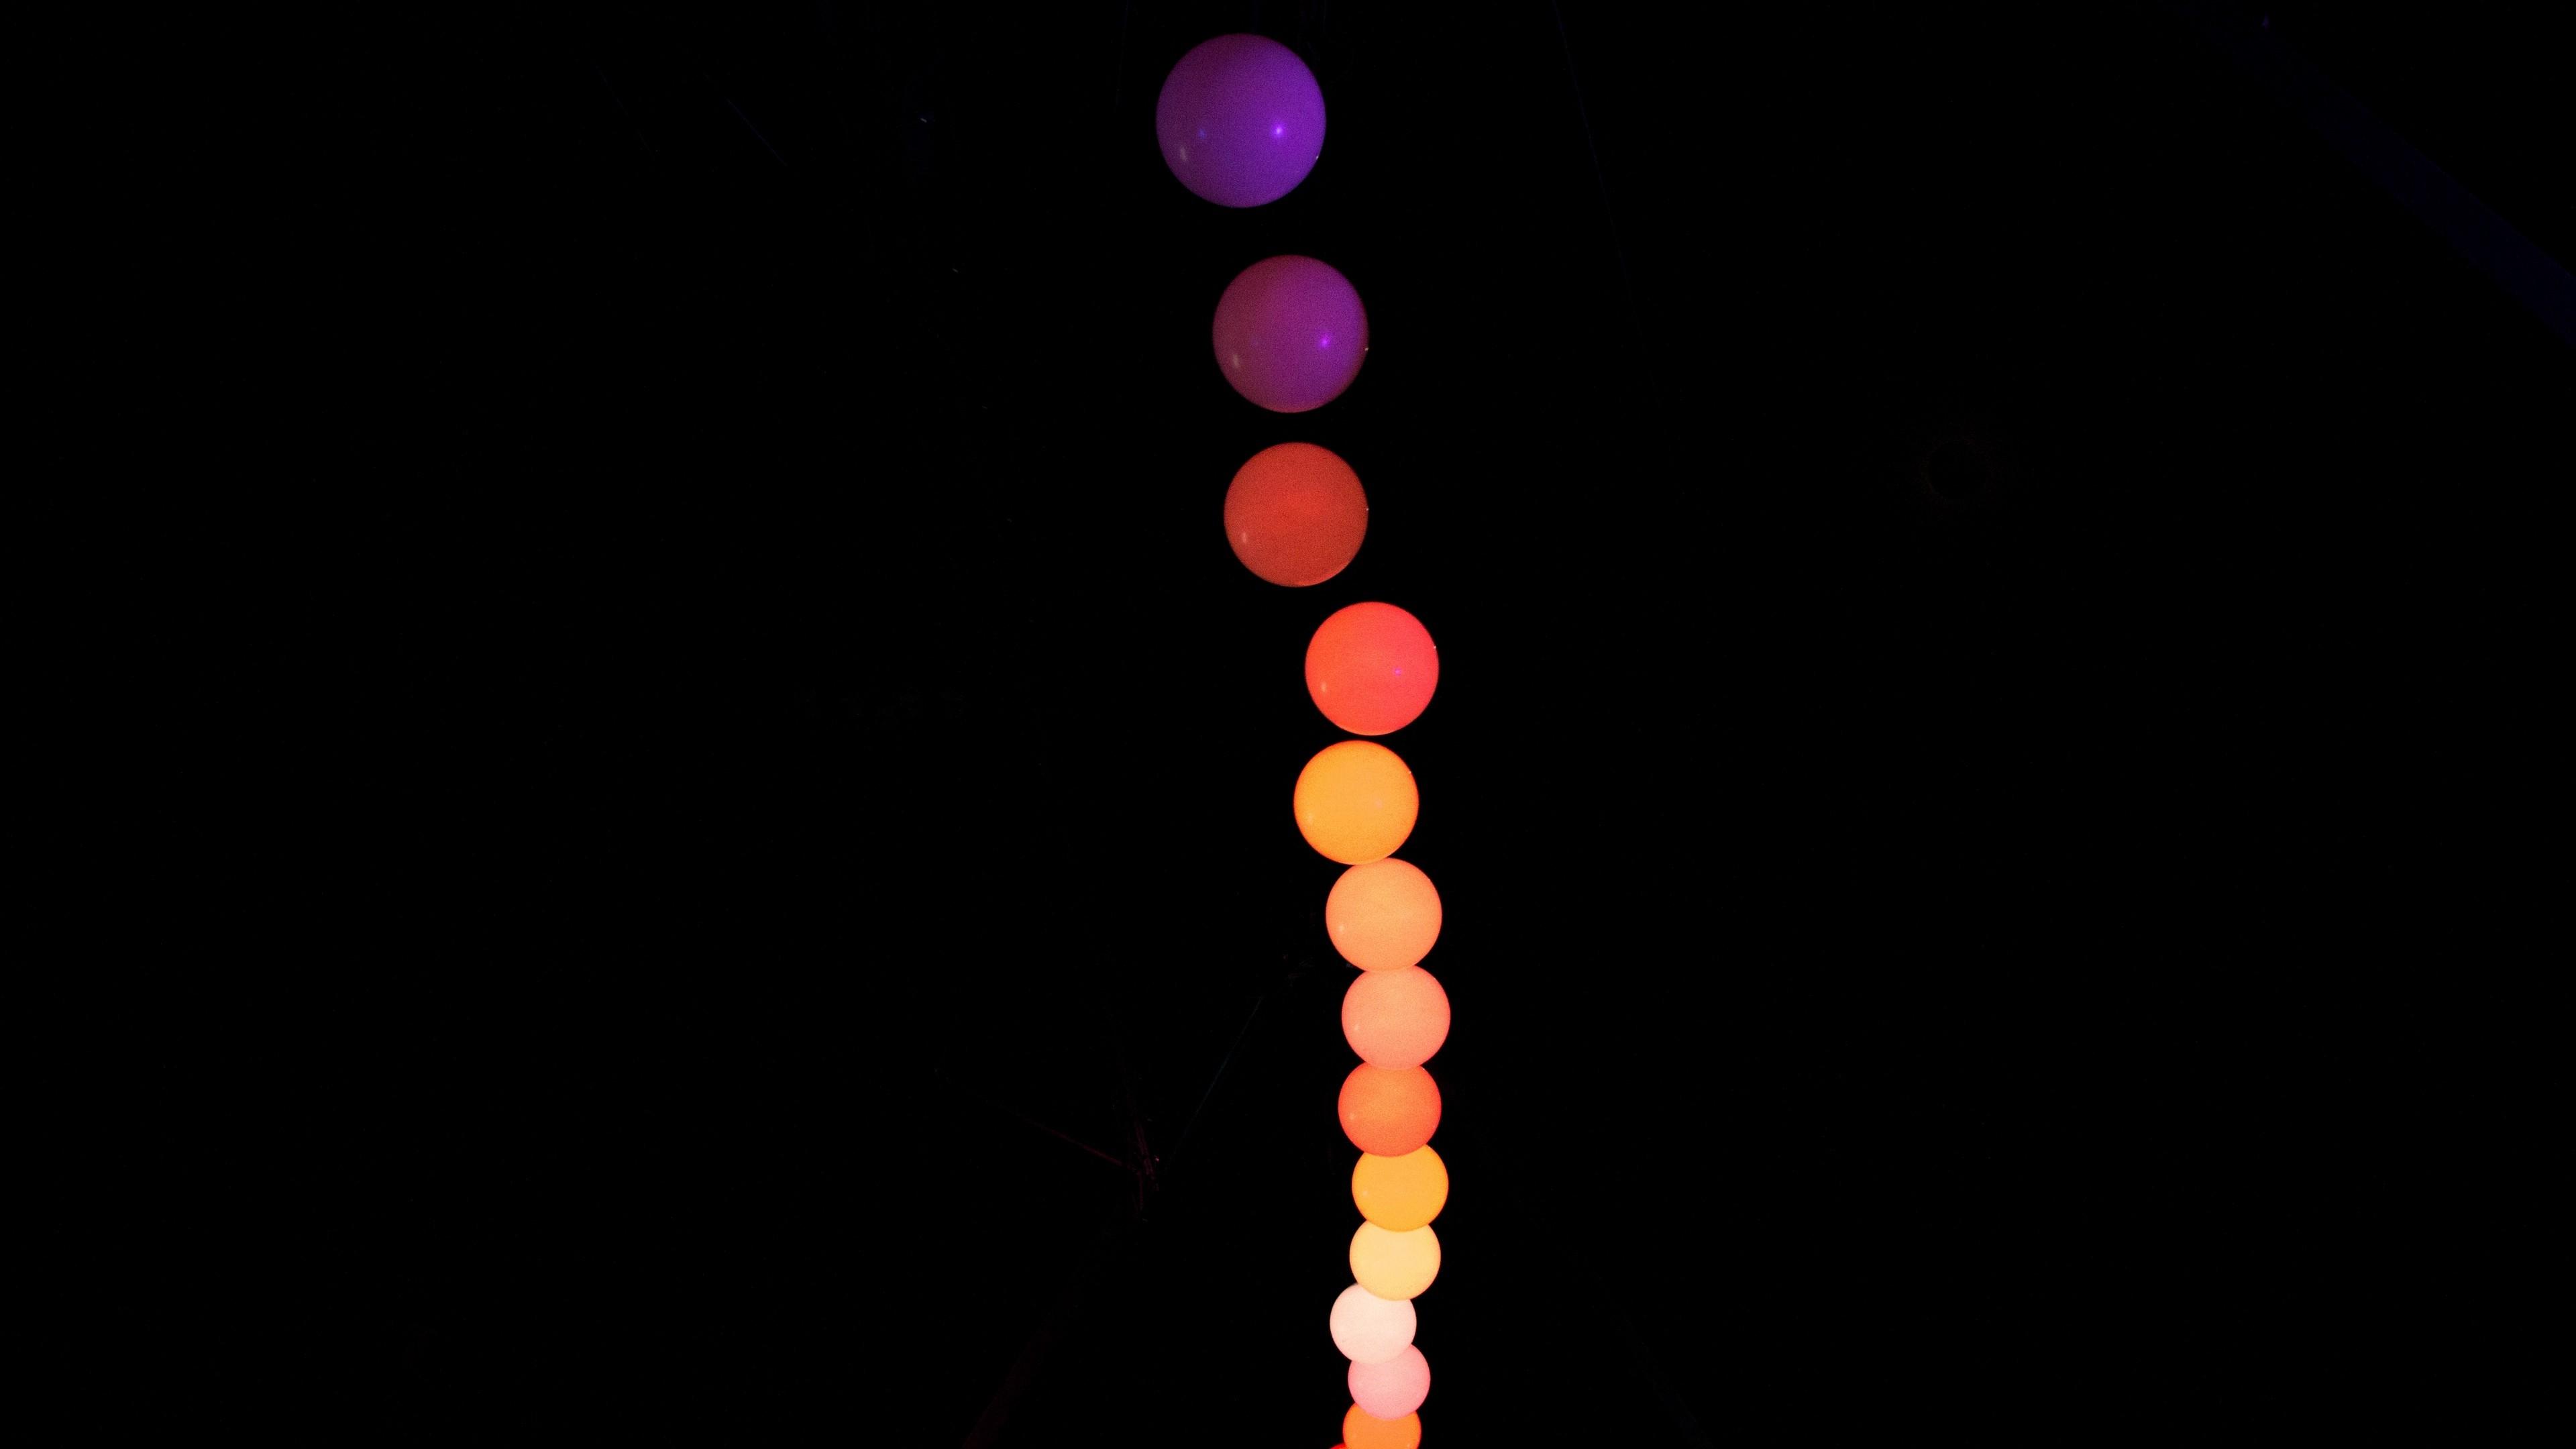 4K Balls Colorful Neon Wallpaper - [3840x2160]